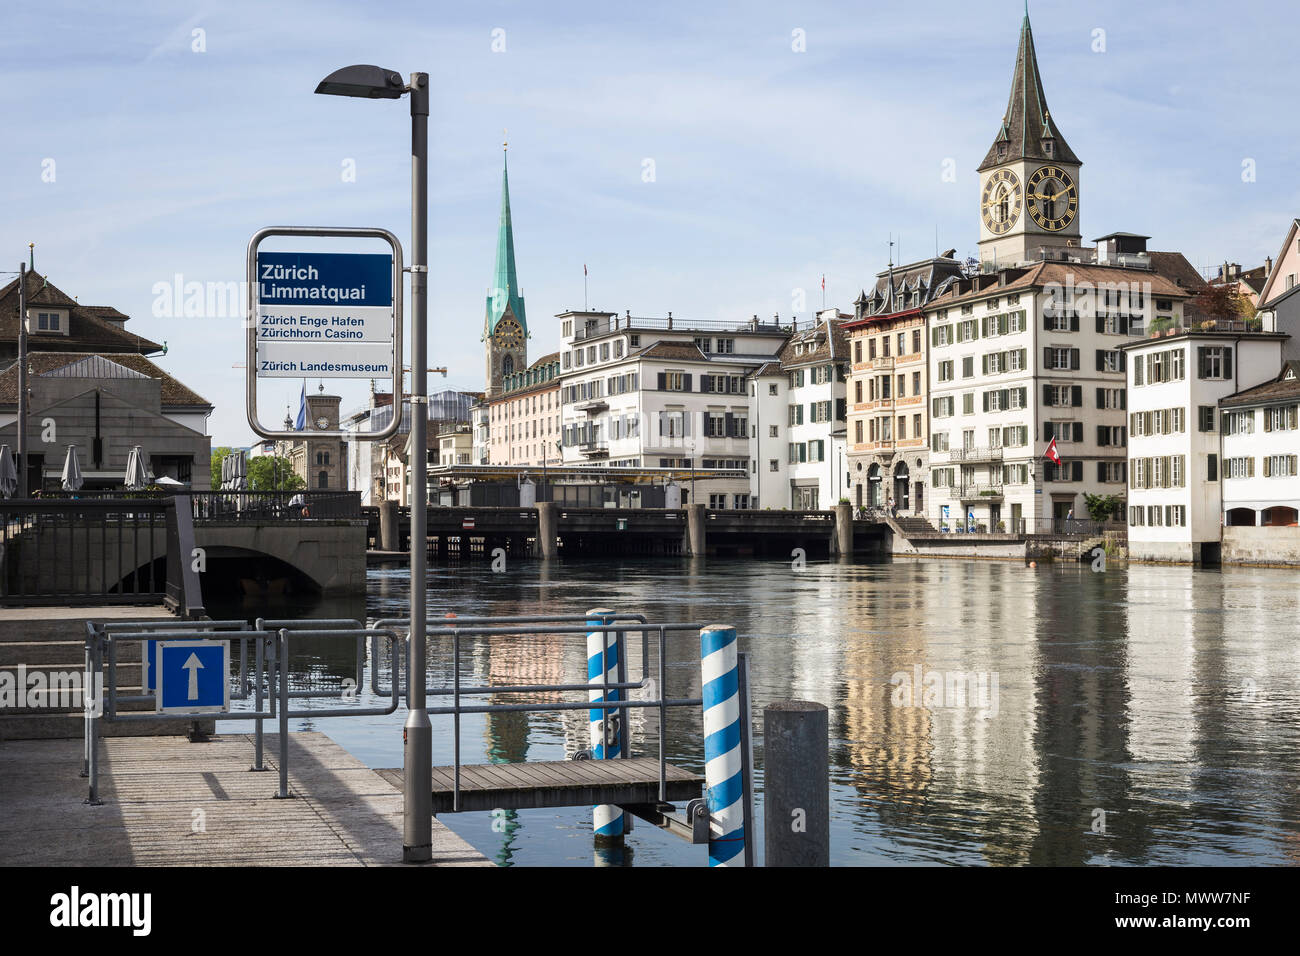 The Limmat river in Zurich's Old Town, Canton of Zurich, Switzerland - Stock Image